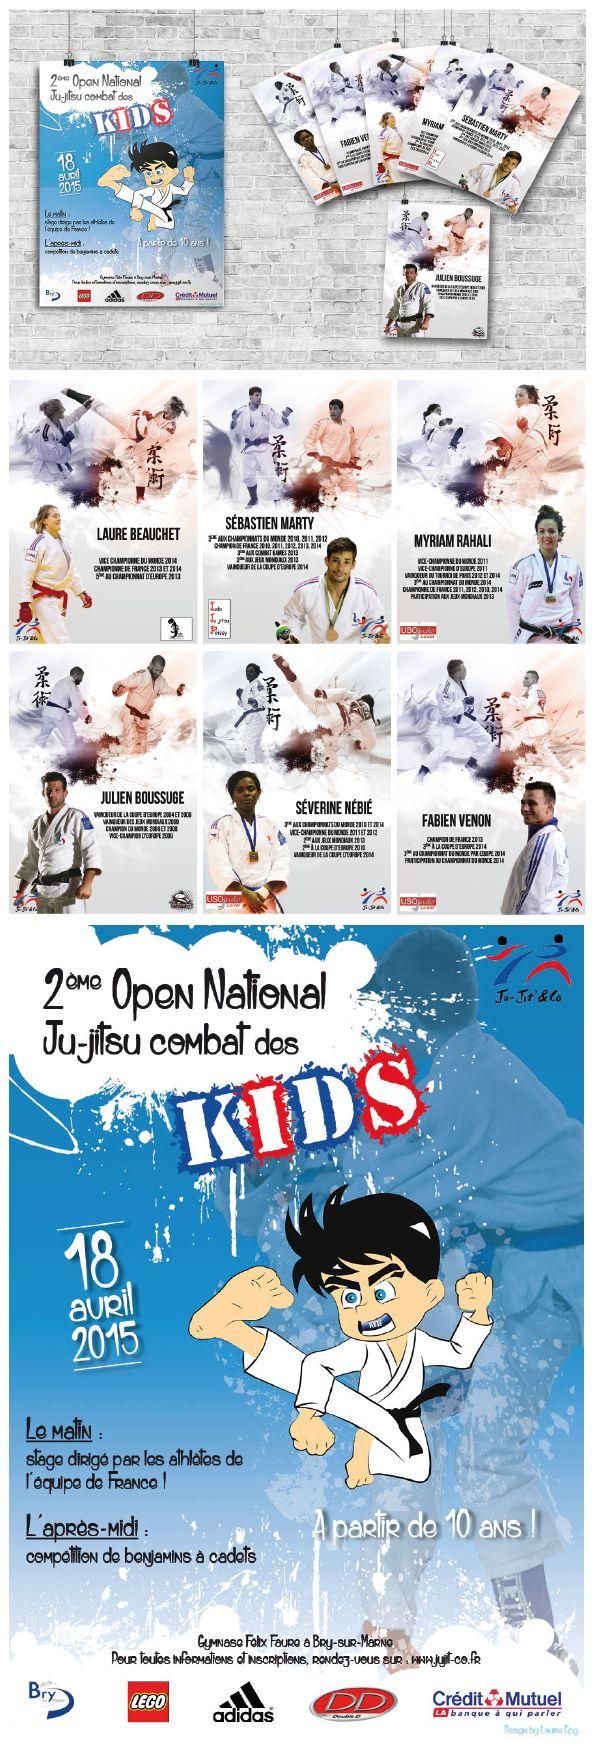 Promotion open des kids ju-jitsu 2015. Affiche et flyers des athlètes #sport #ju-jitsu #affiche #flyers #poster #promotion #enfants